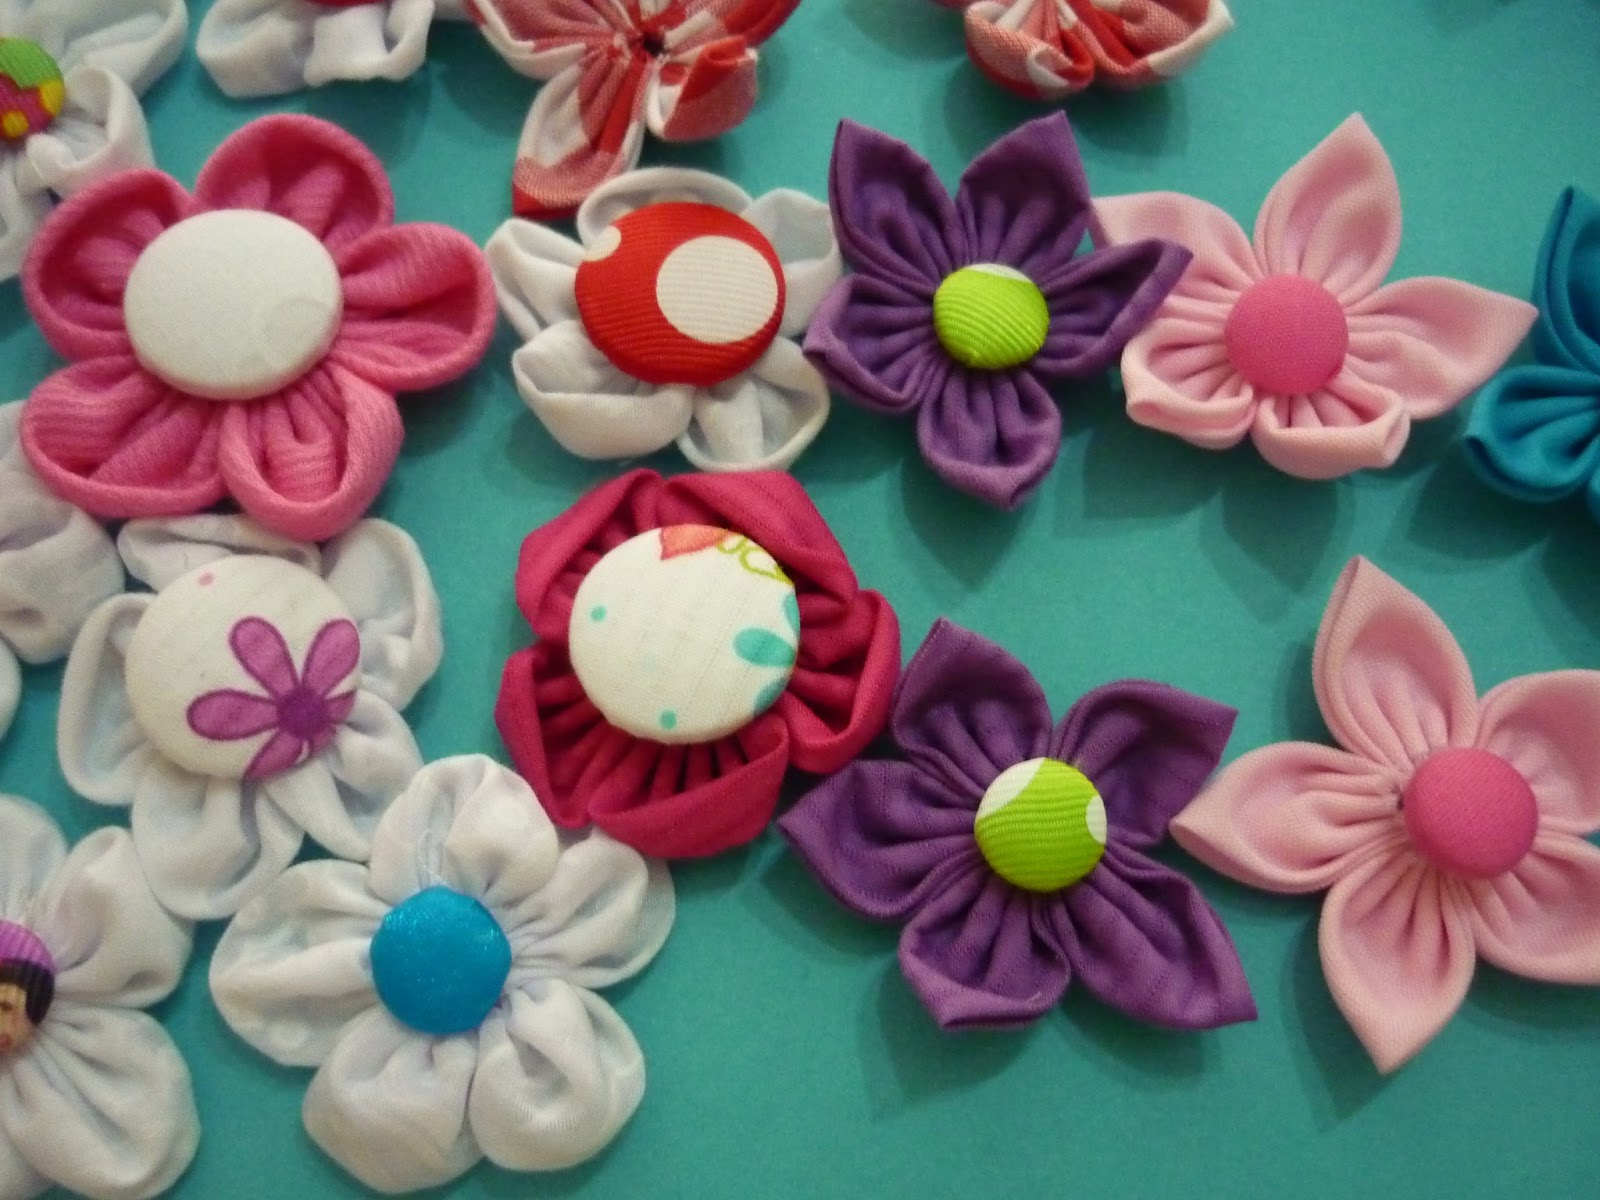 Materiales para manualidades flores en tela para decorar - Manualidades de telas ...